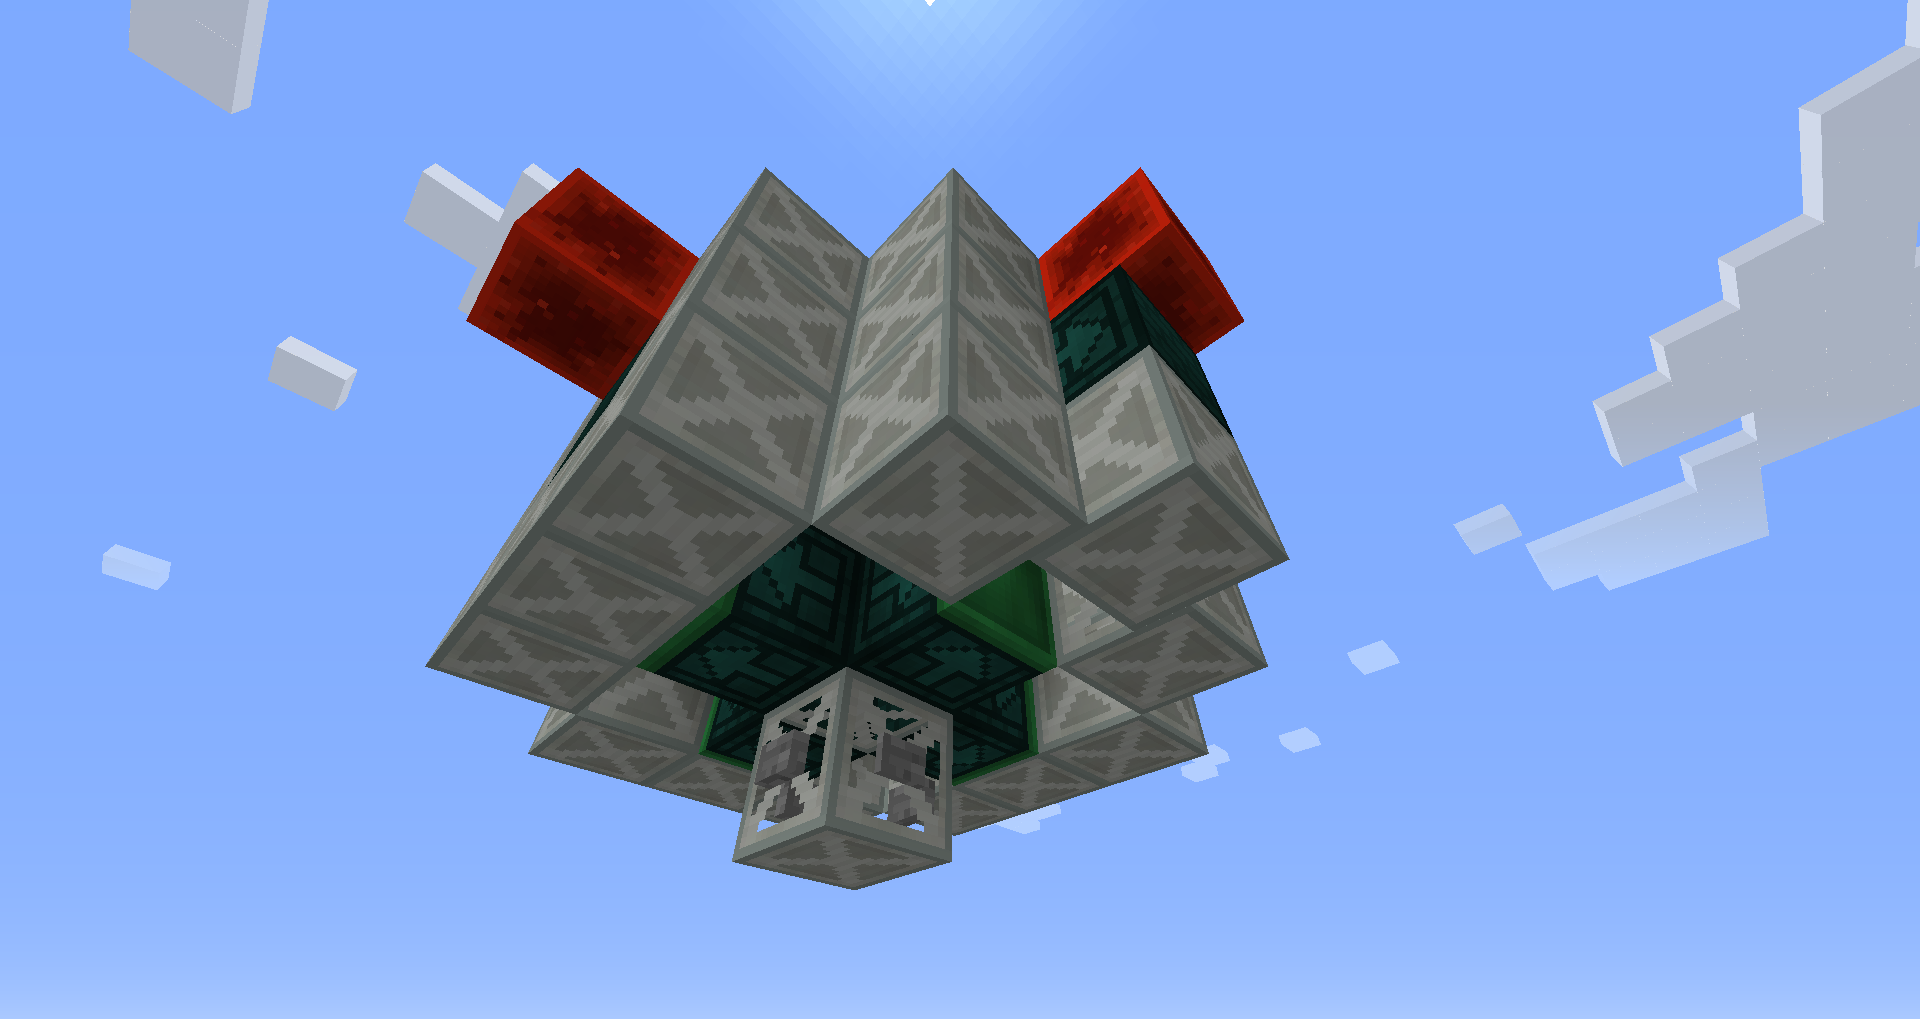 Mothership zeta (ufo) minecraft project.